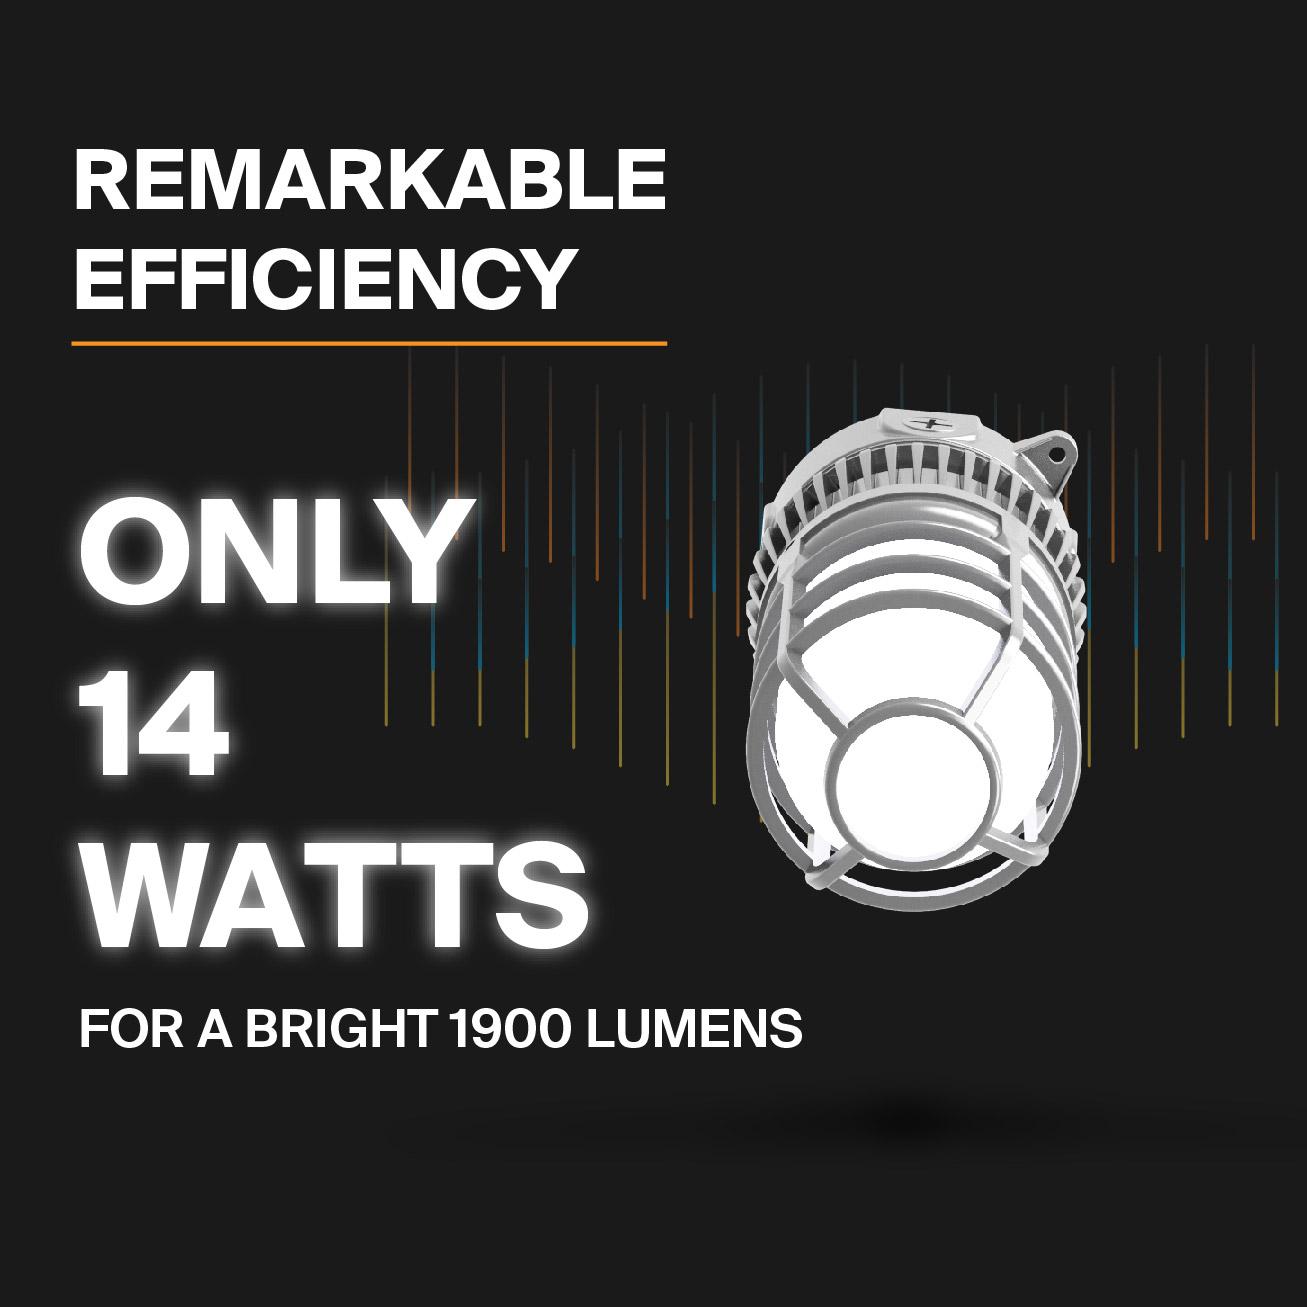 Probrite Vapor14 LED Ceiling Light Efficiency